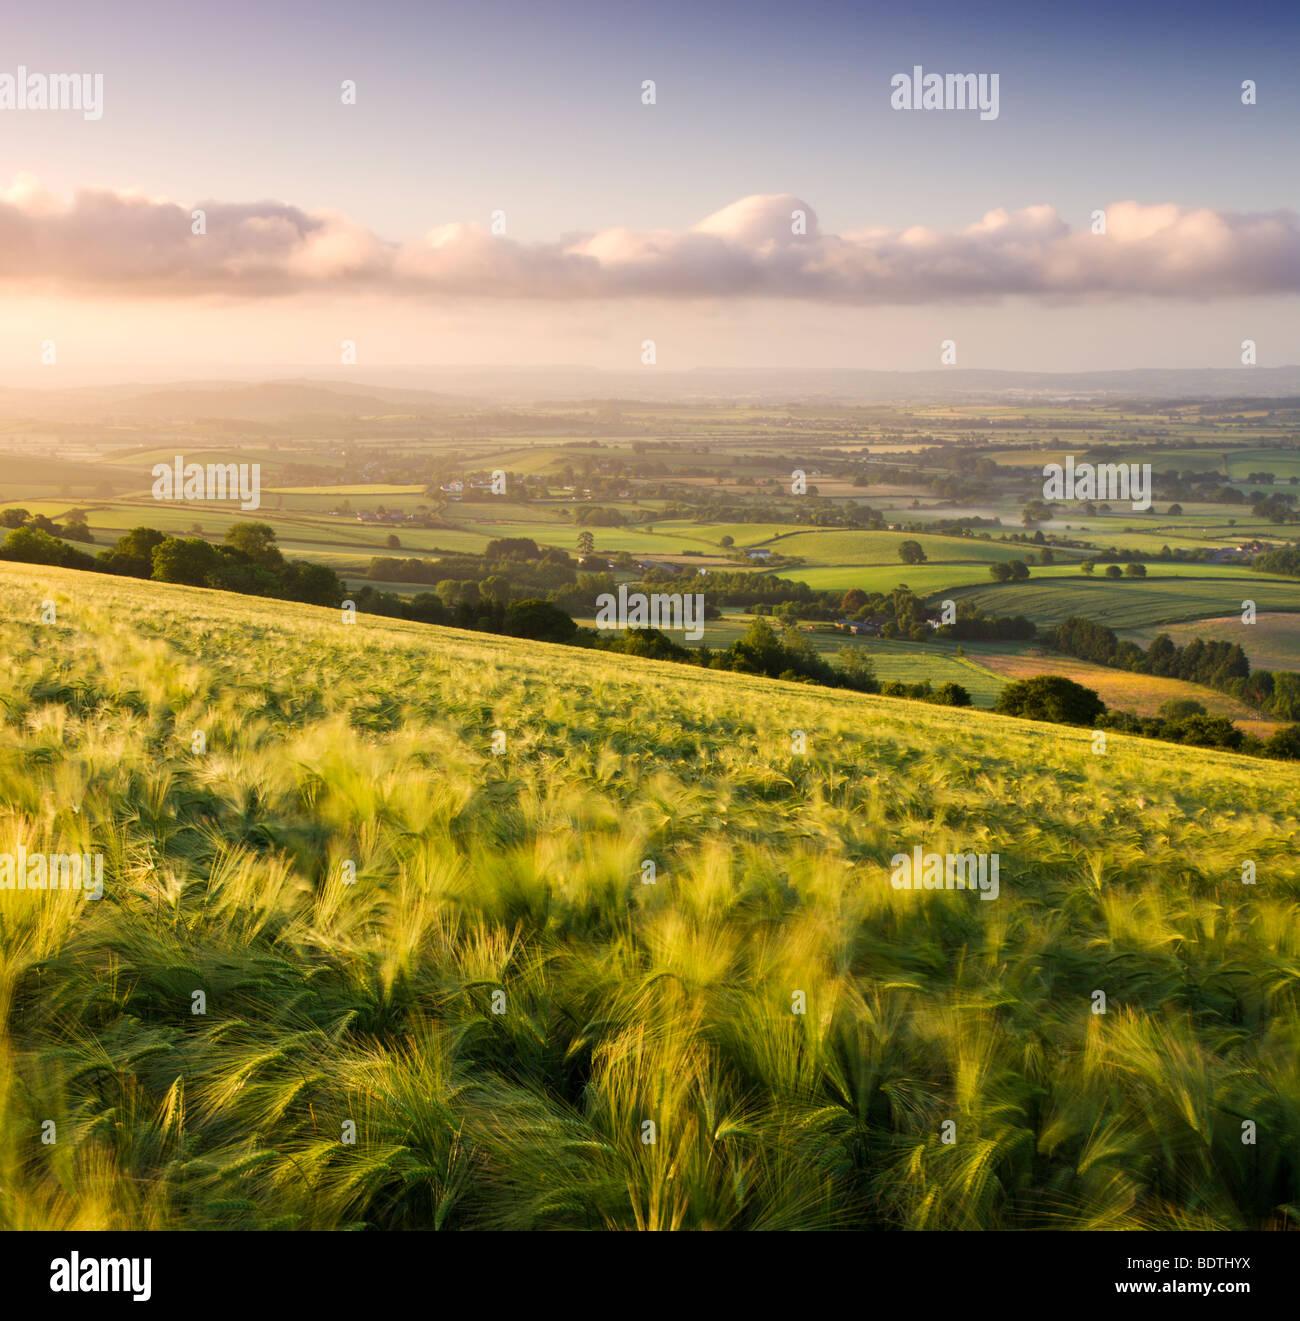 Golden ripened barley growing in a field in rural Devon, England. Summer (June) 2009 - Stock Image